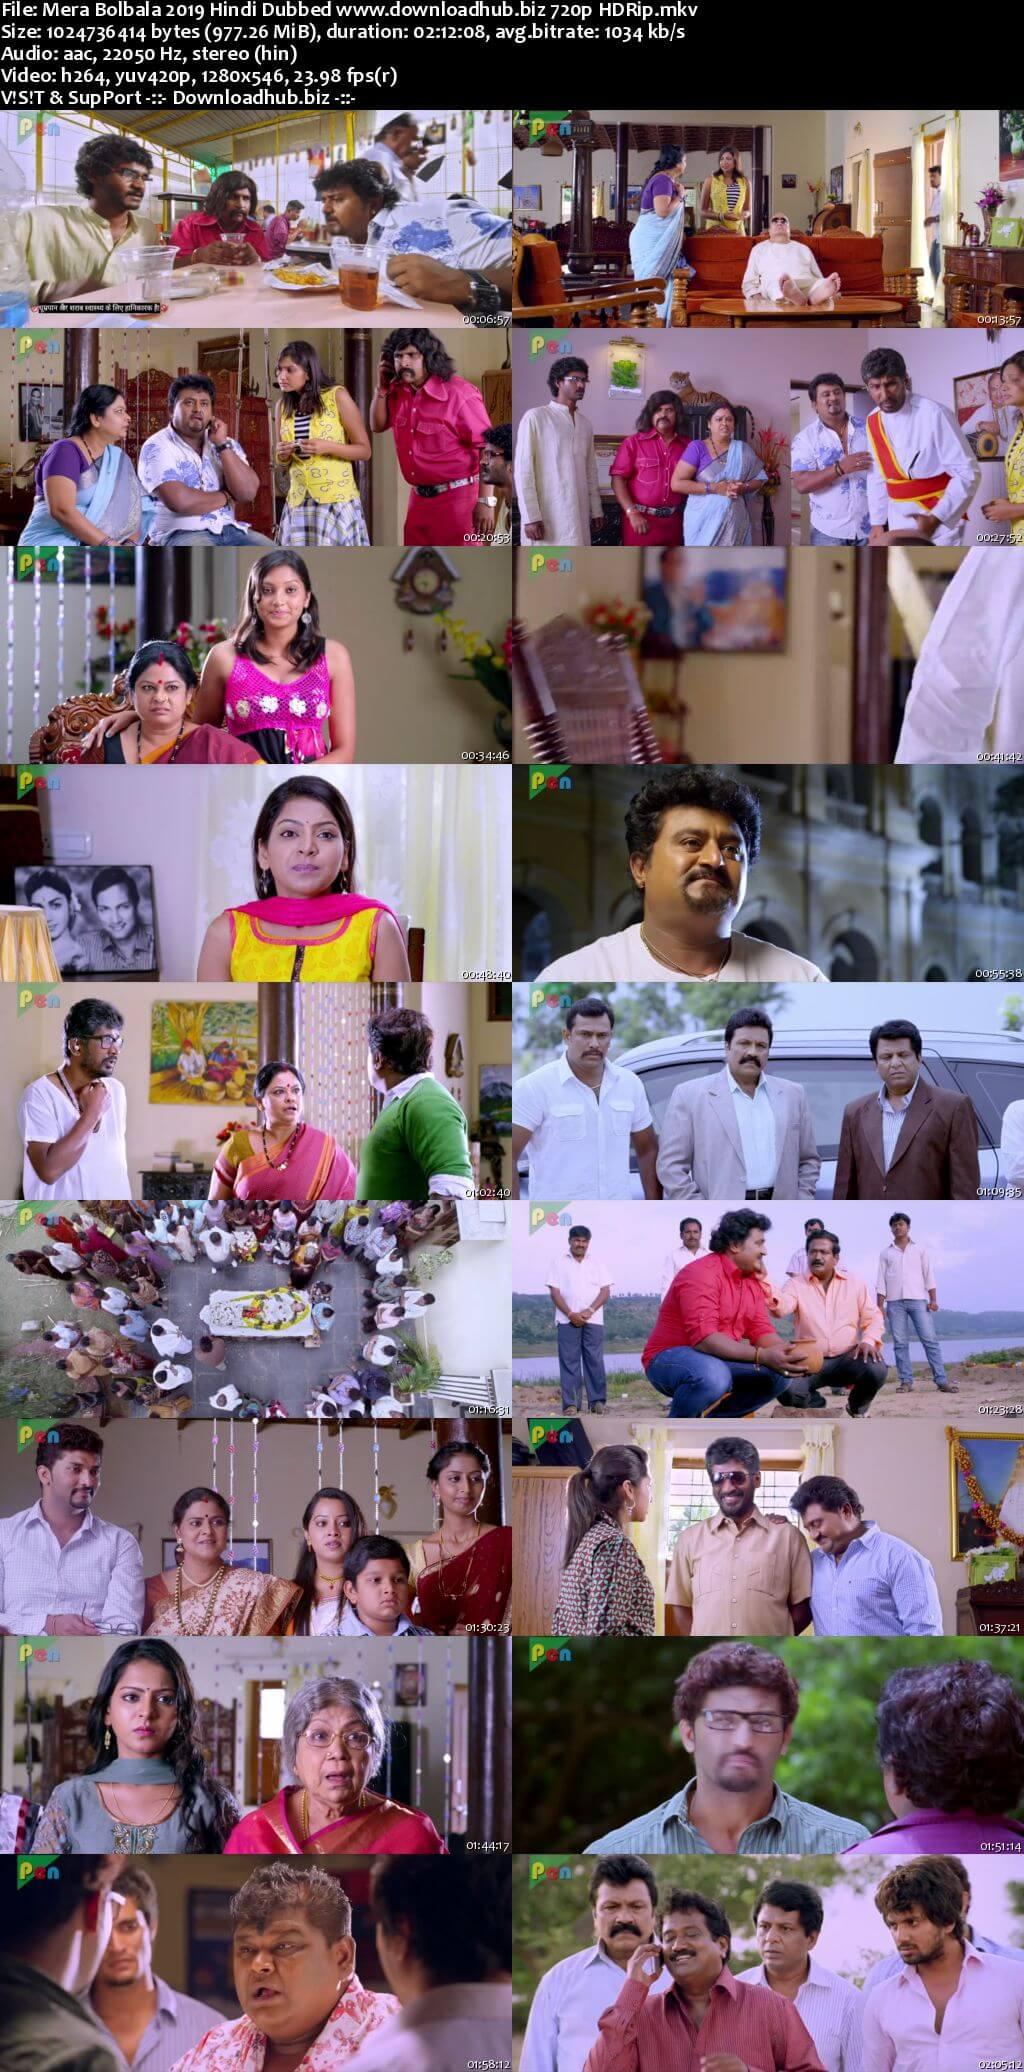 Mera Bolbala 2019 Hindi Dubbed 720p HDRip x264